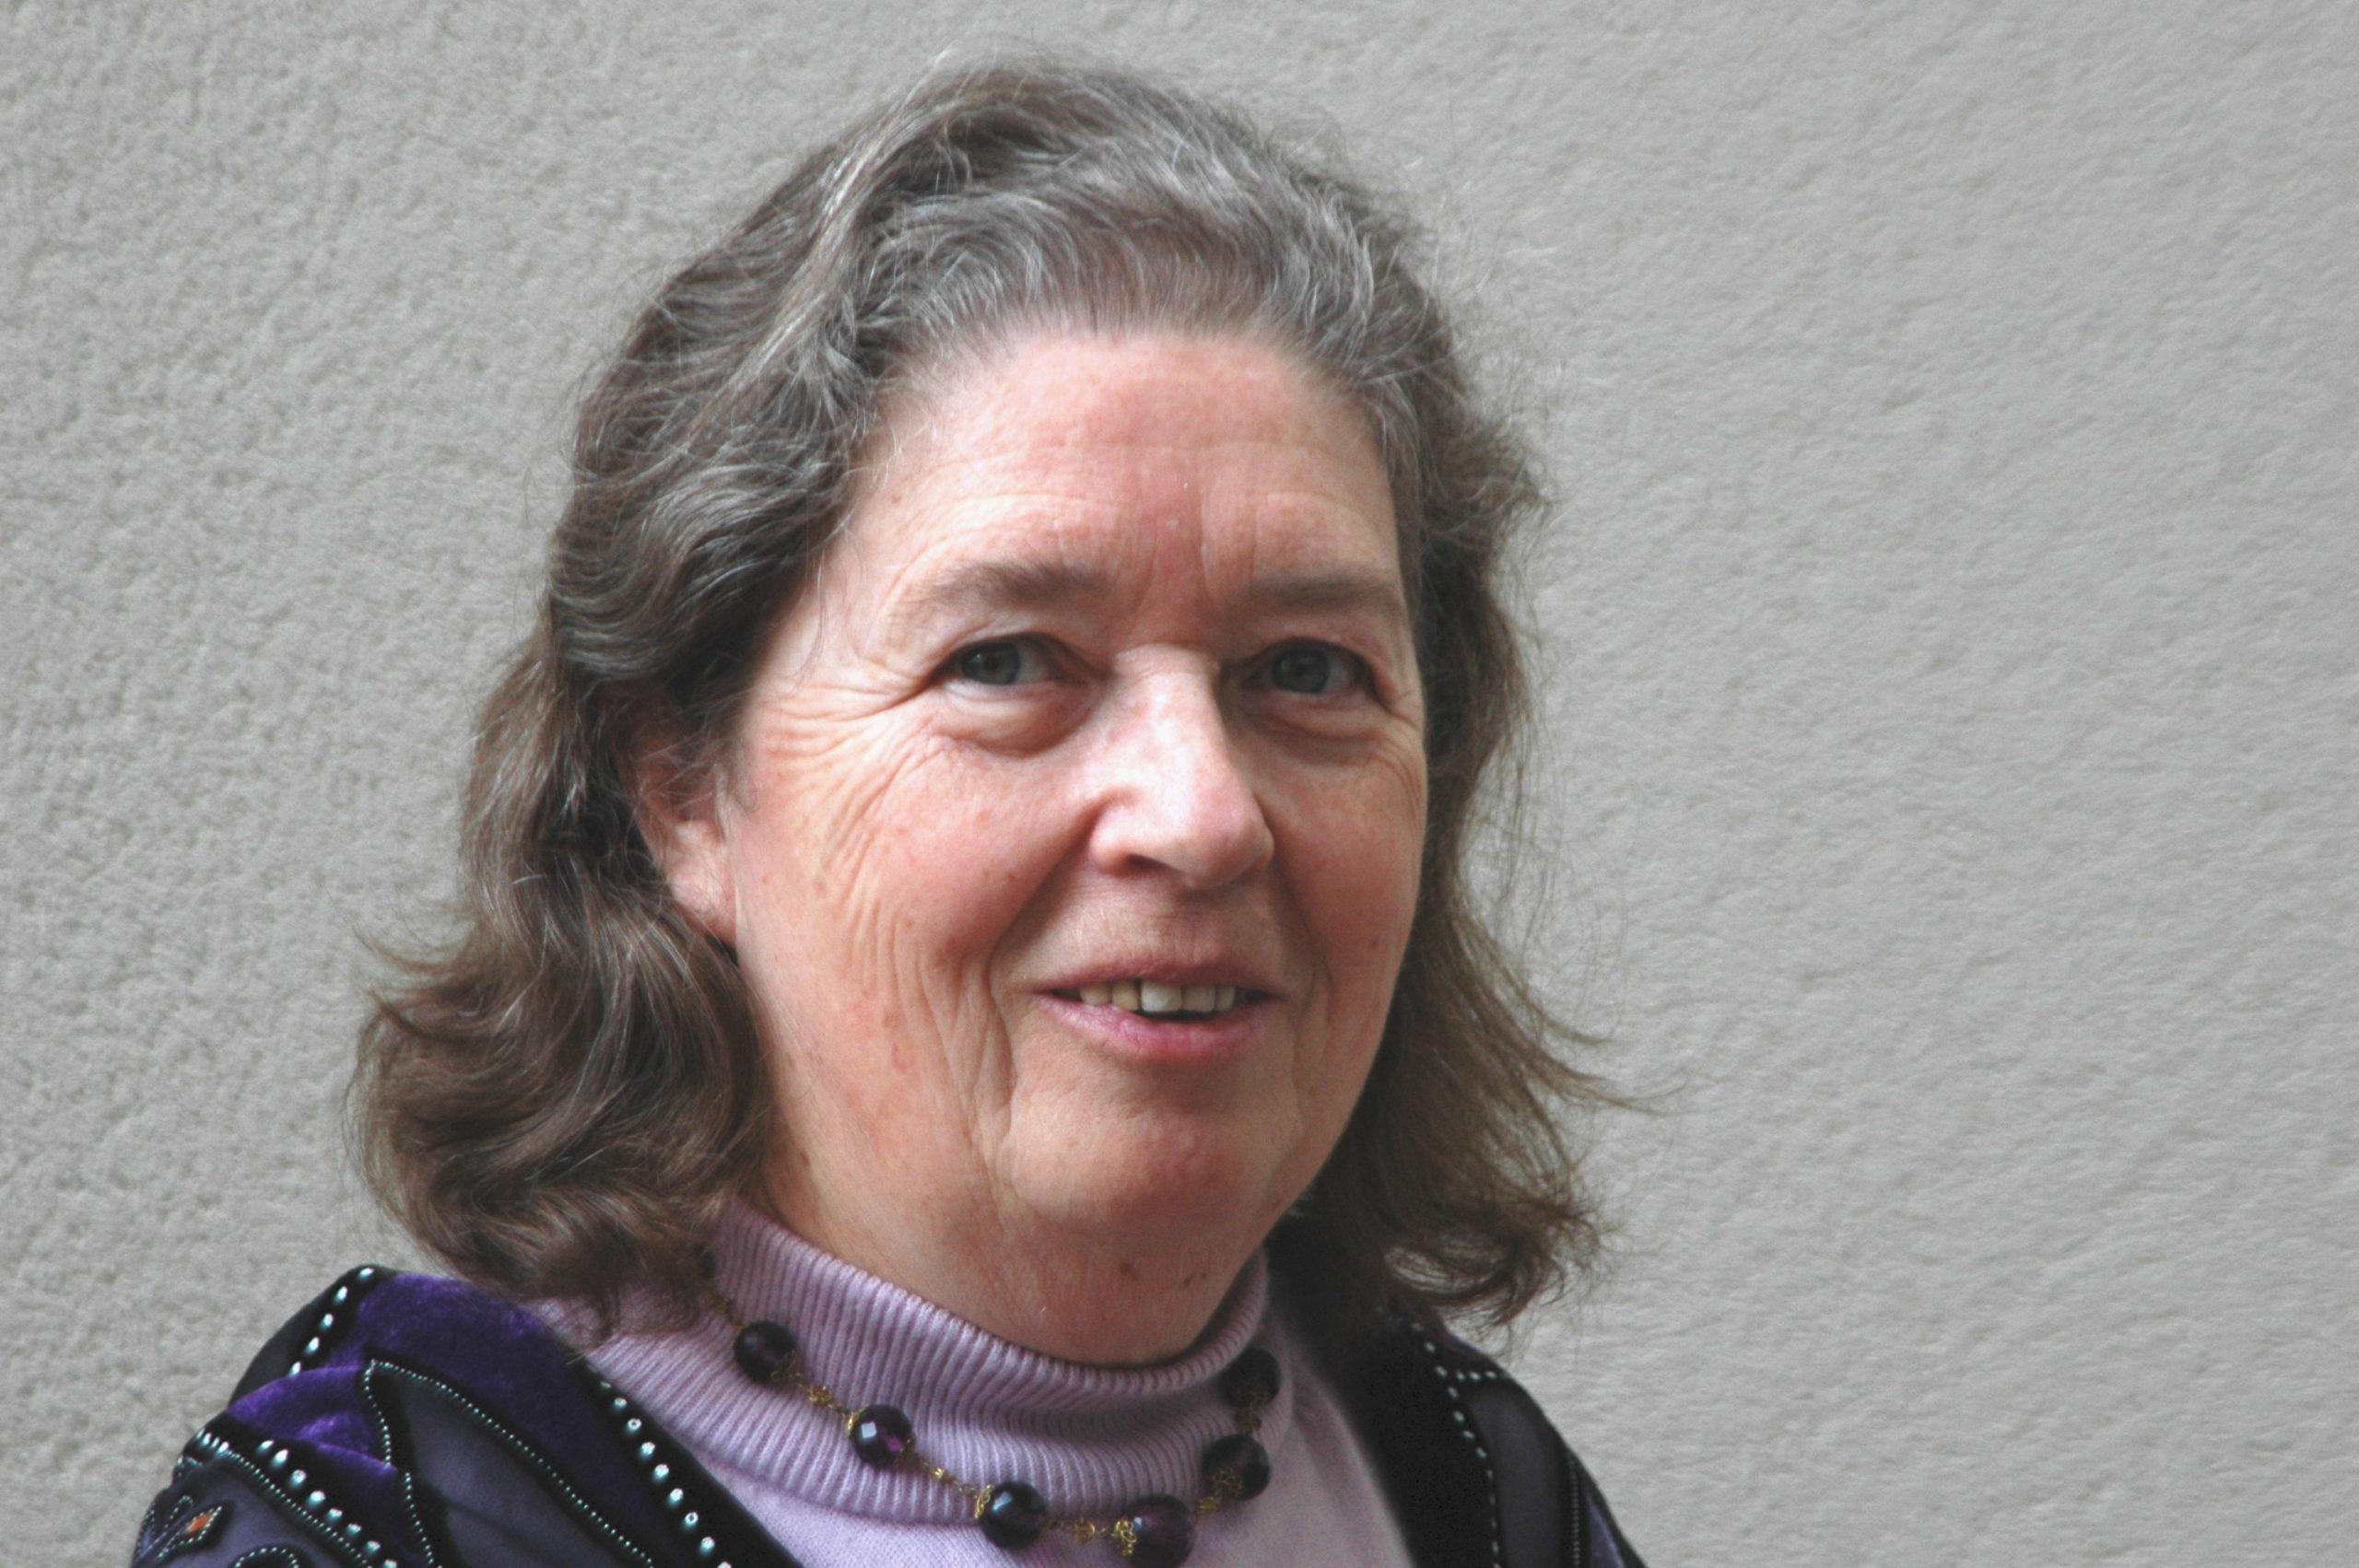 Natalia Demidoff